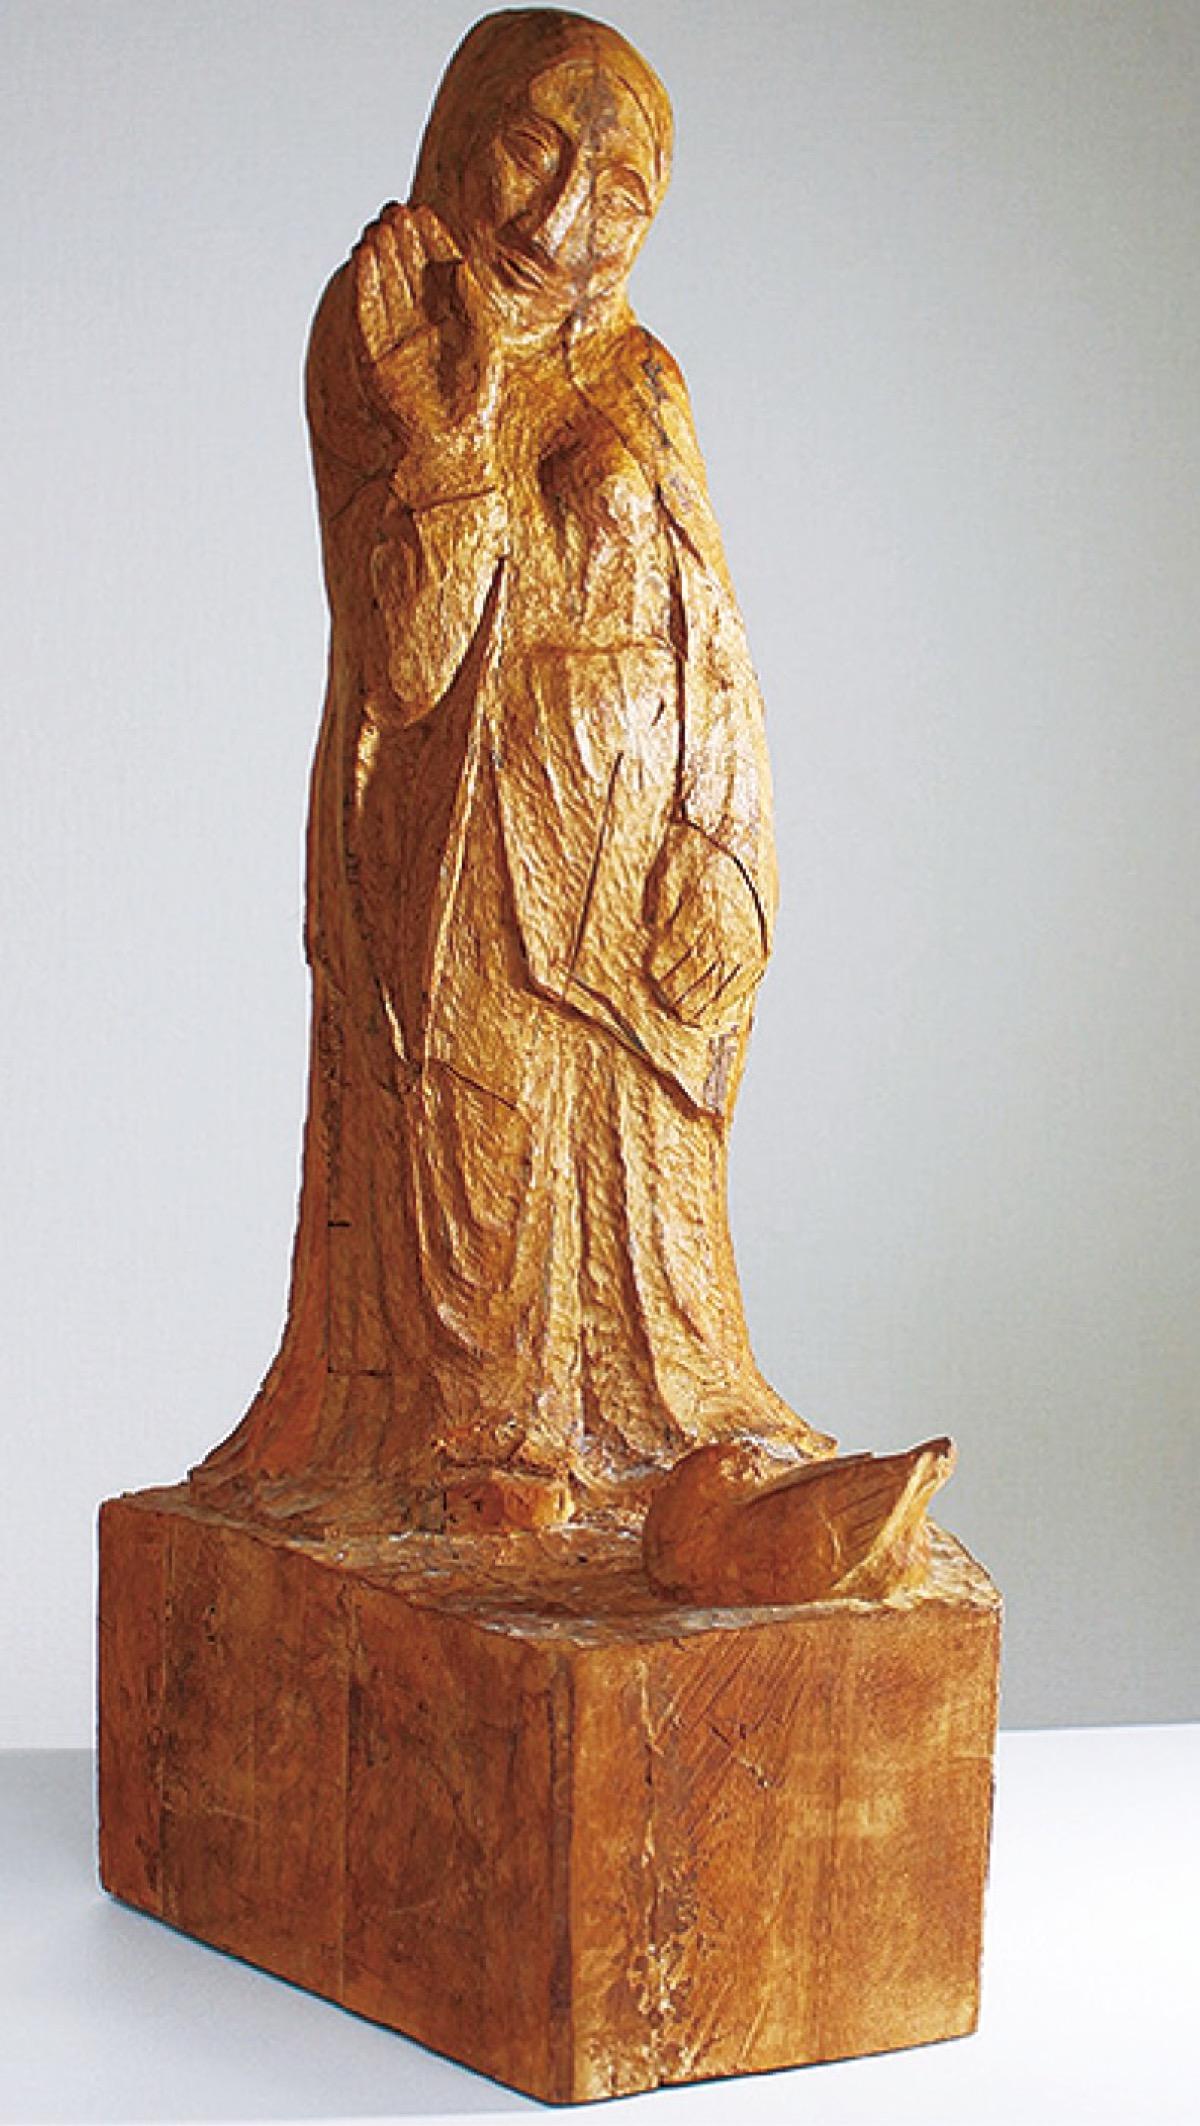 宮永岳彦生誕100年記念事業 彫刻家・小島弘の回顧展 22日まで市民 ...